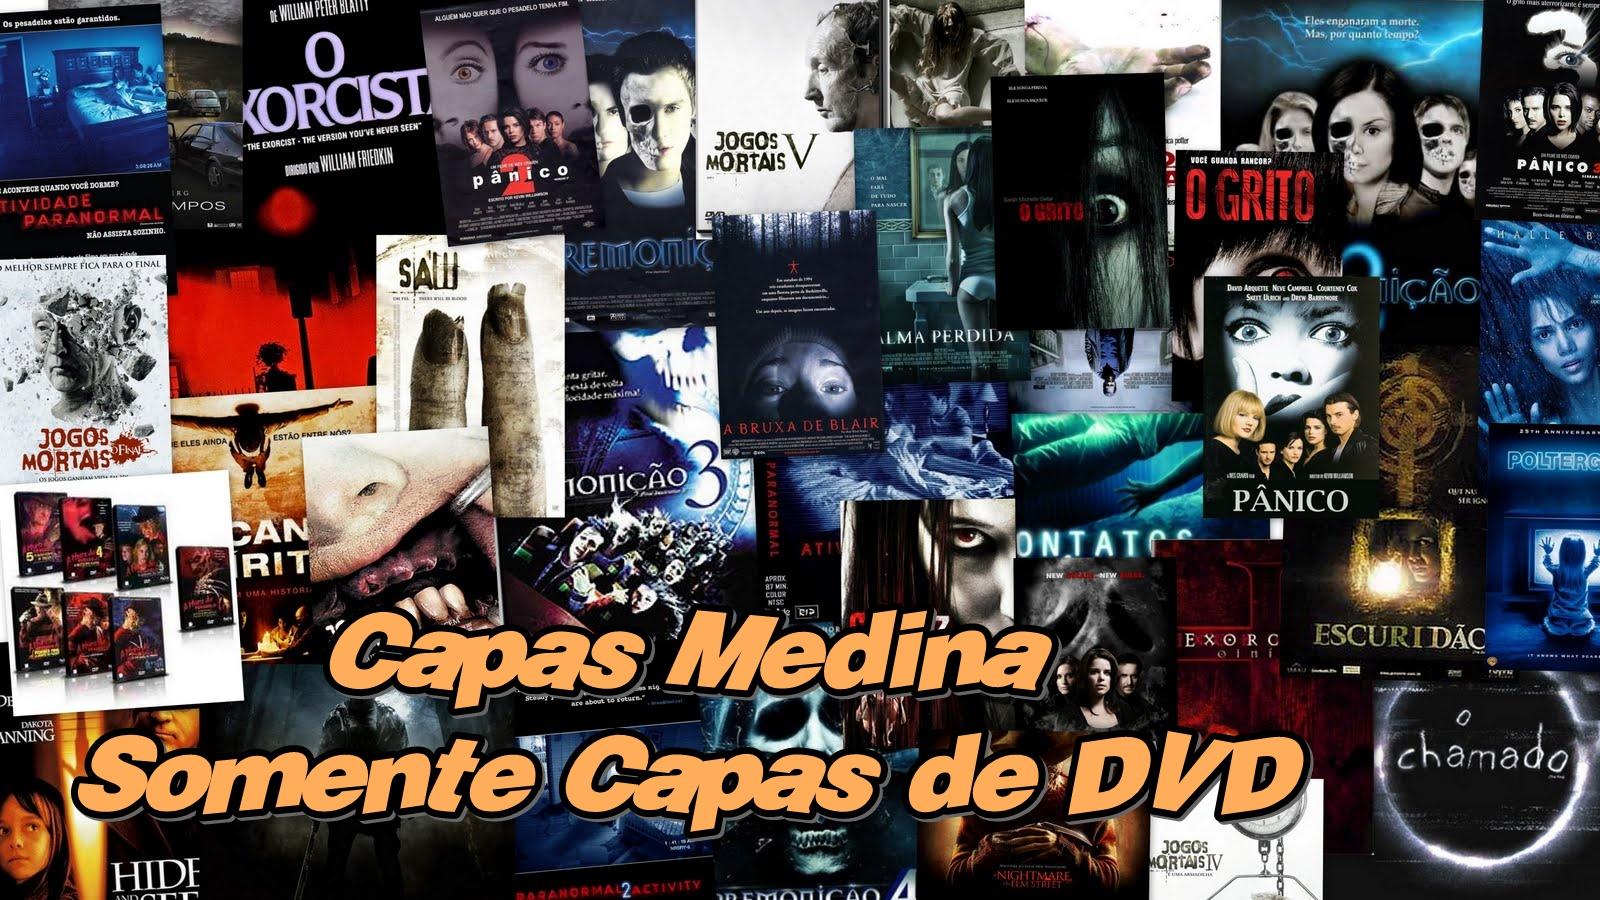 Capas Medina - Somente Capas de DVD